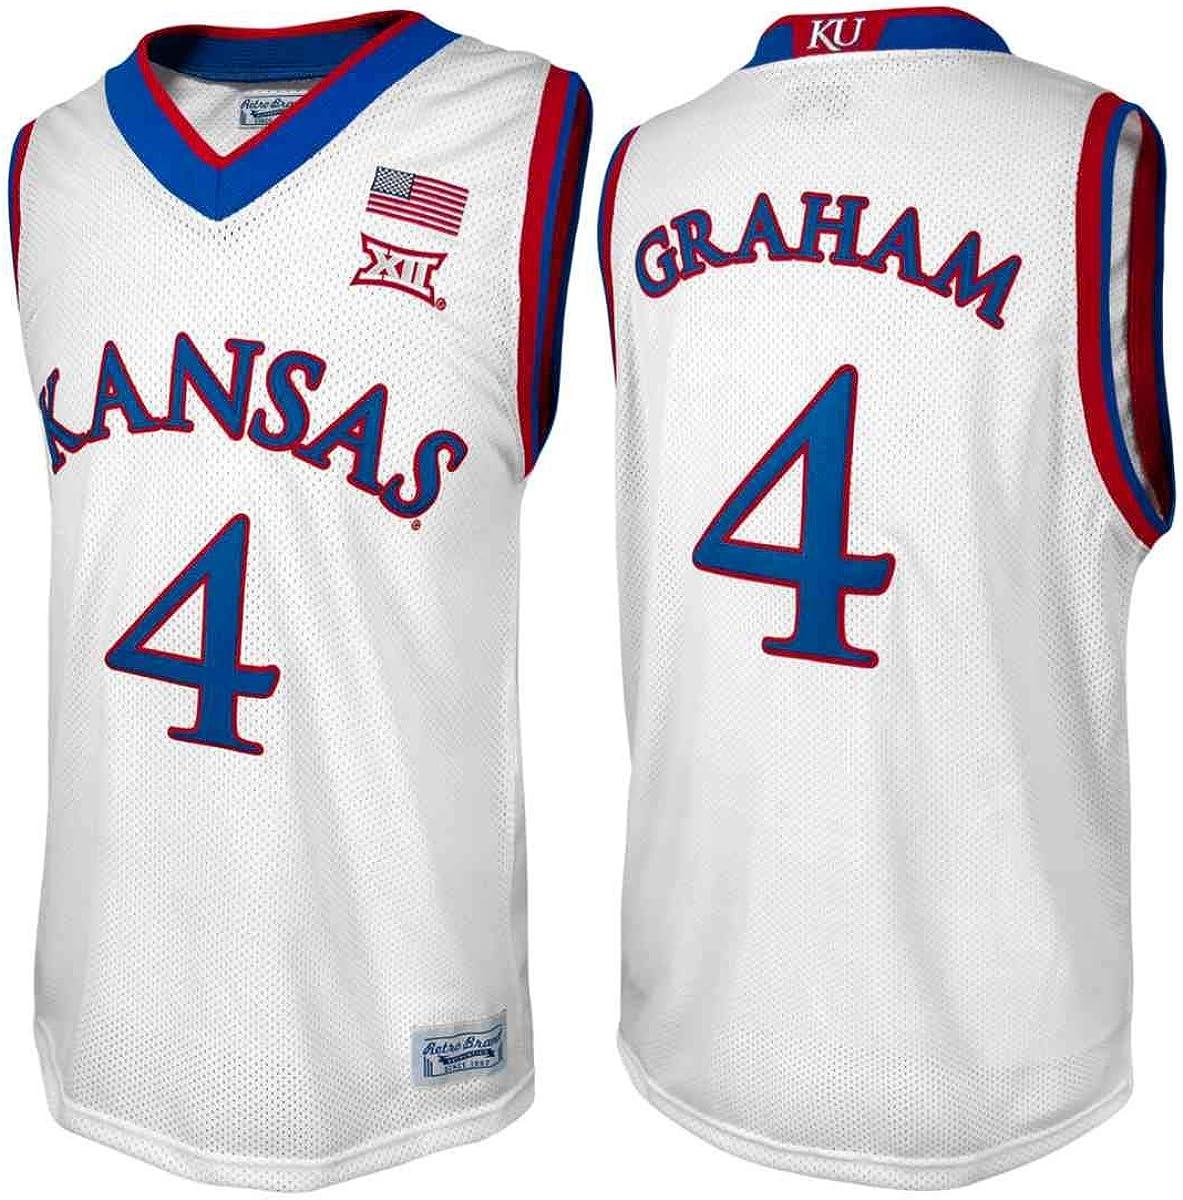 Devonte' Graham #4 Retro Brand Authentic Basketball White Jersey